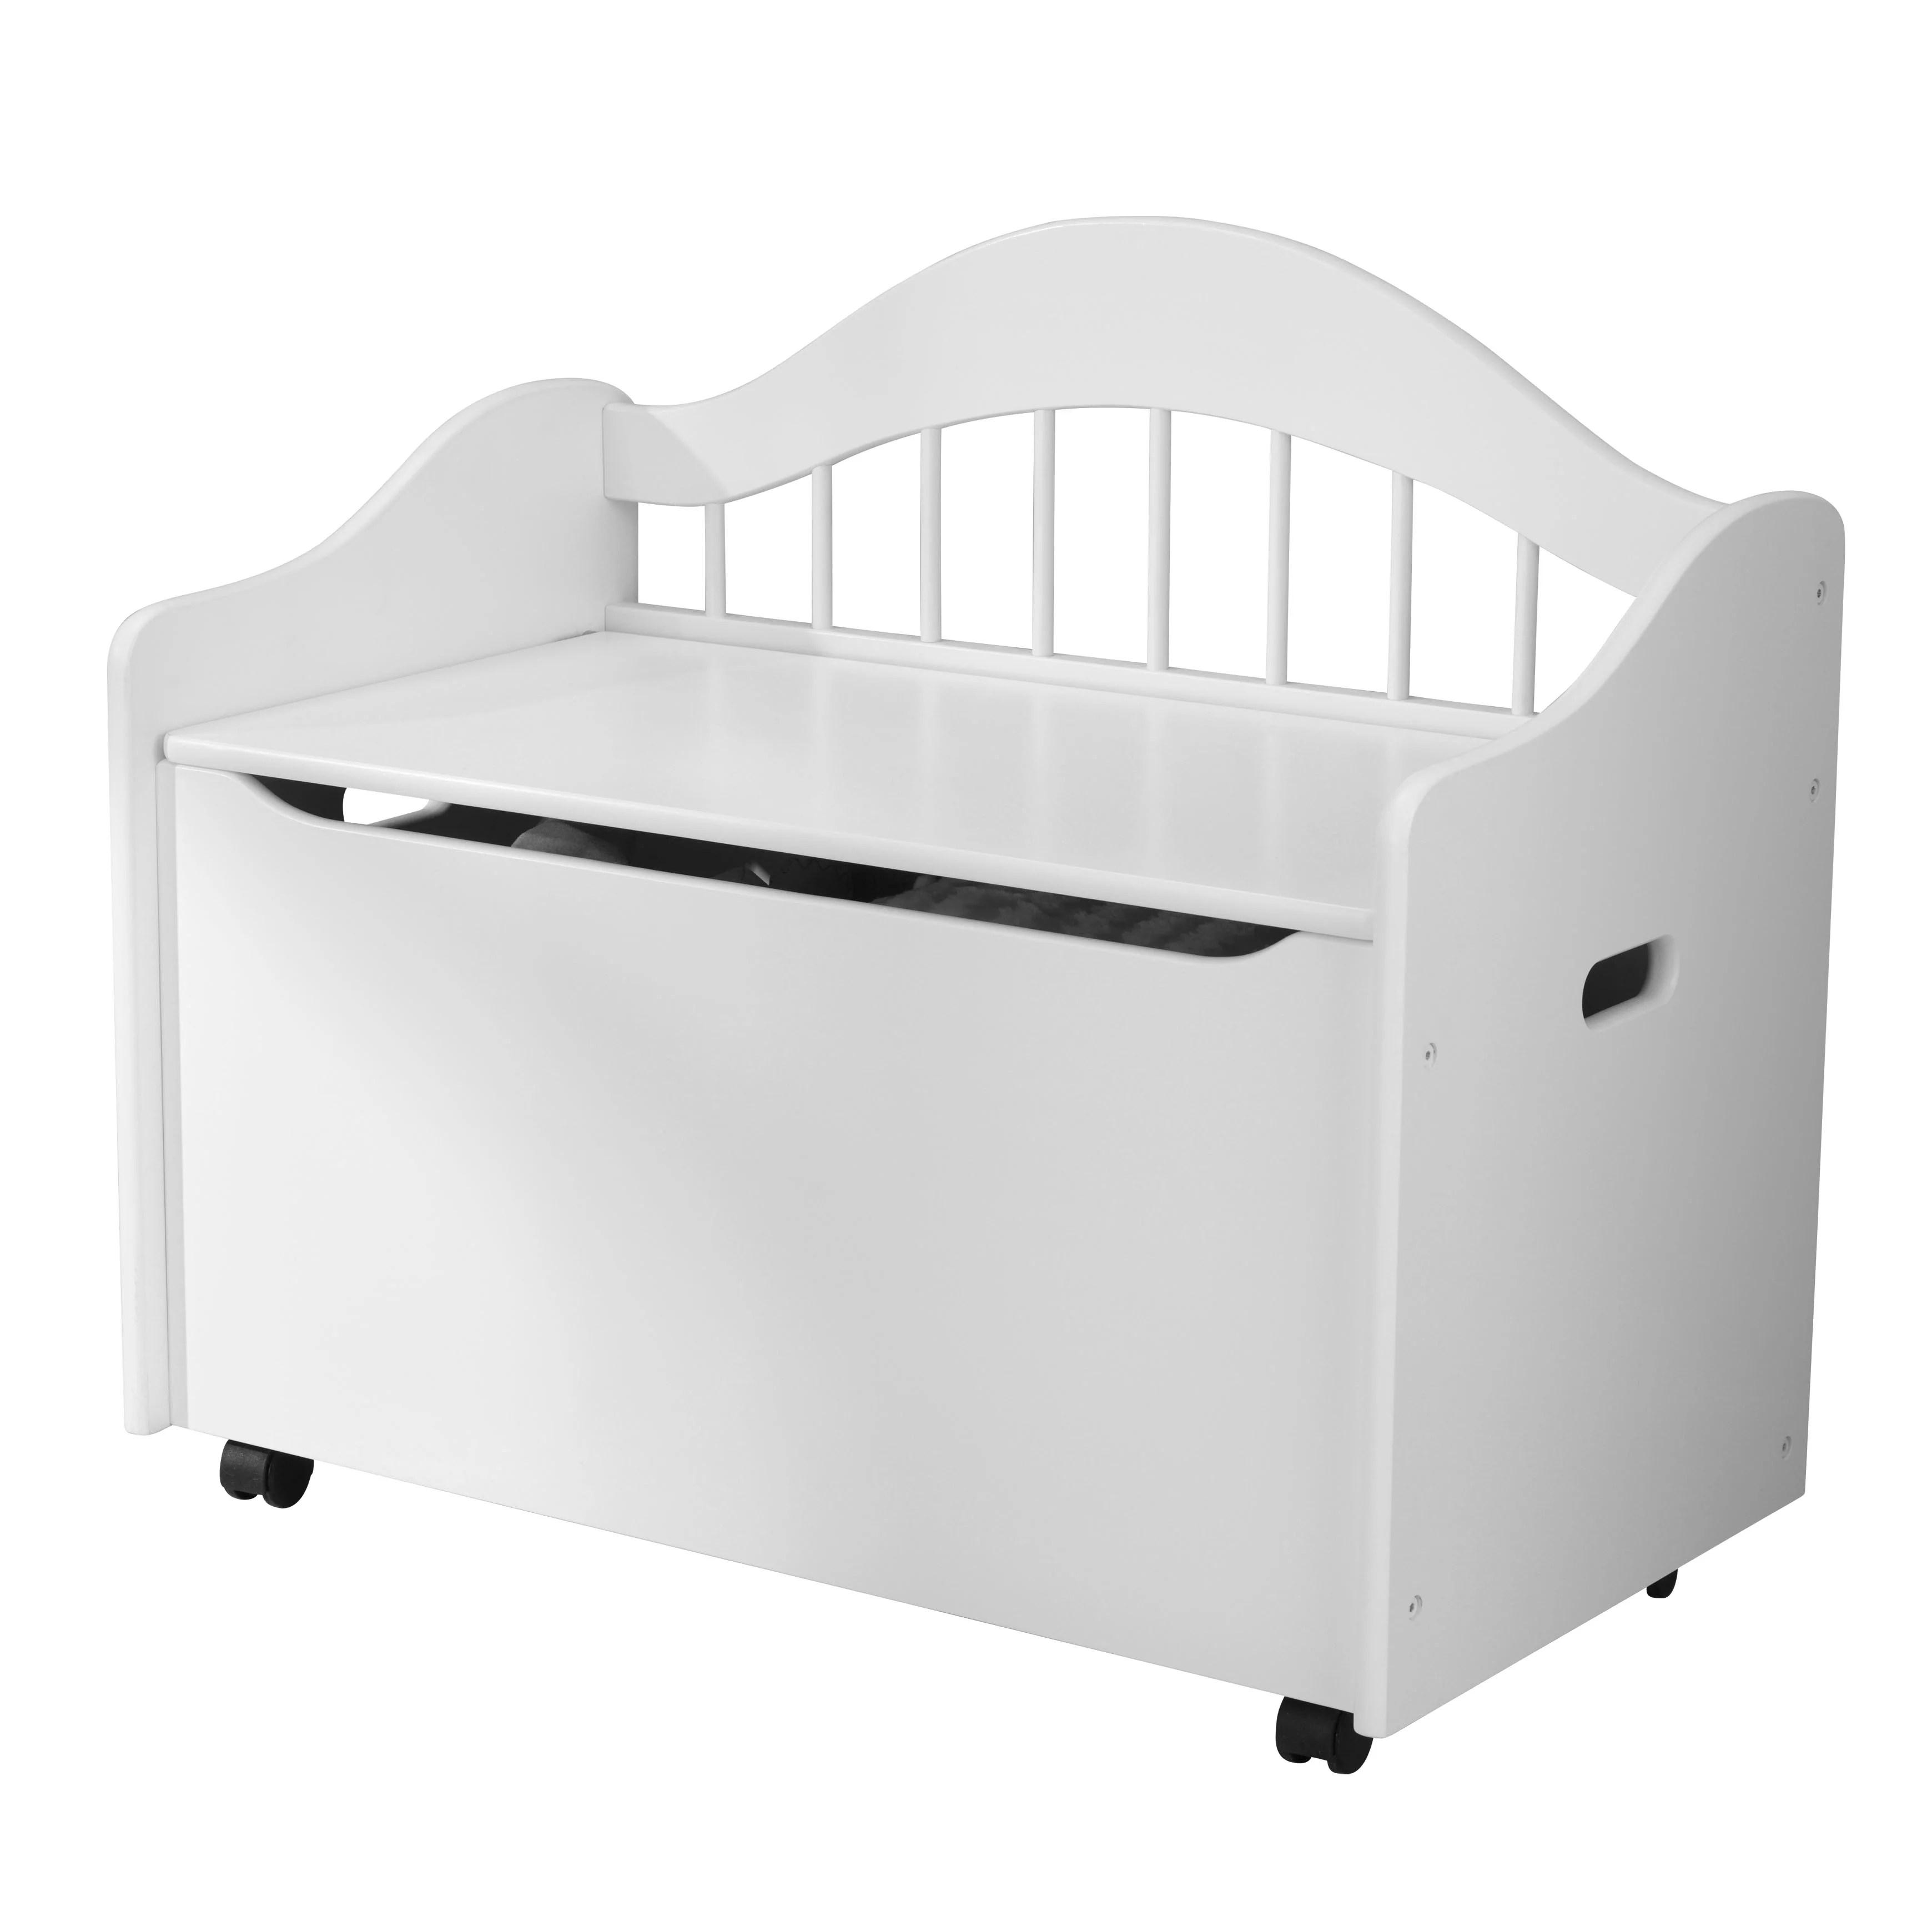 Kidkraft Limited Edition Toy Box White Walmart